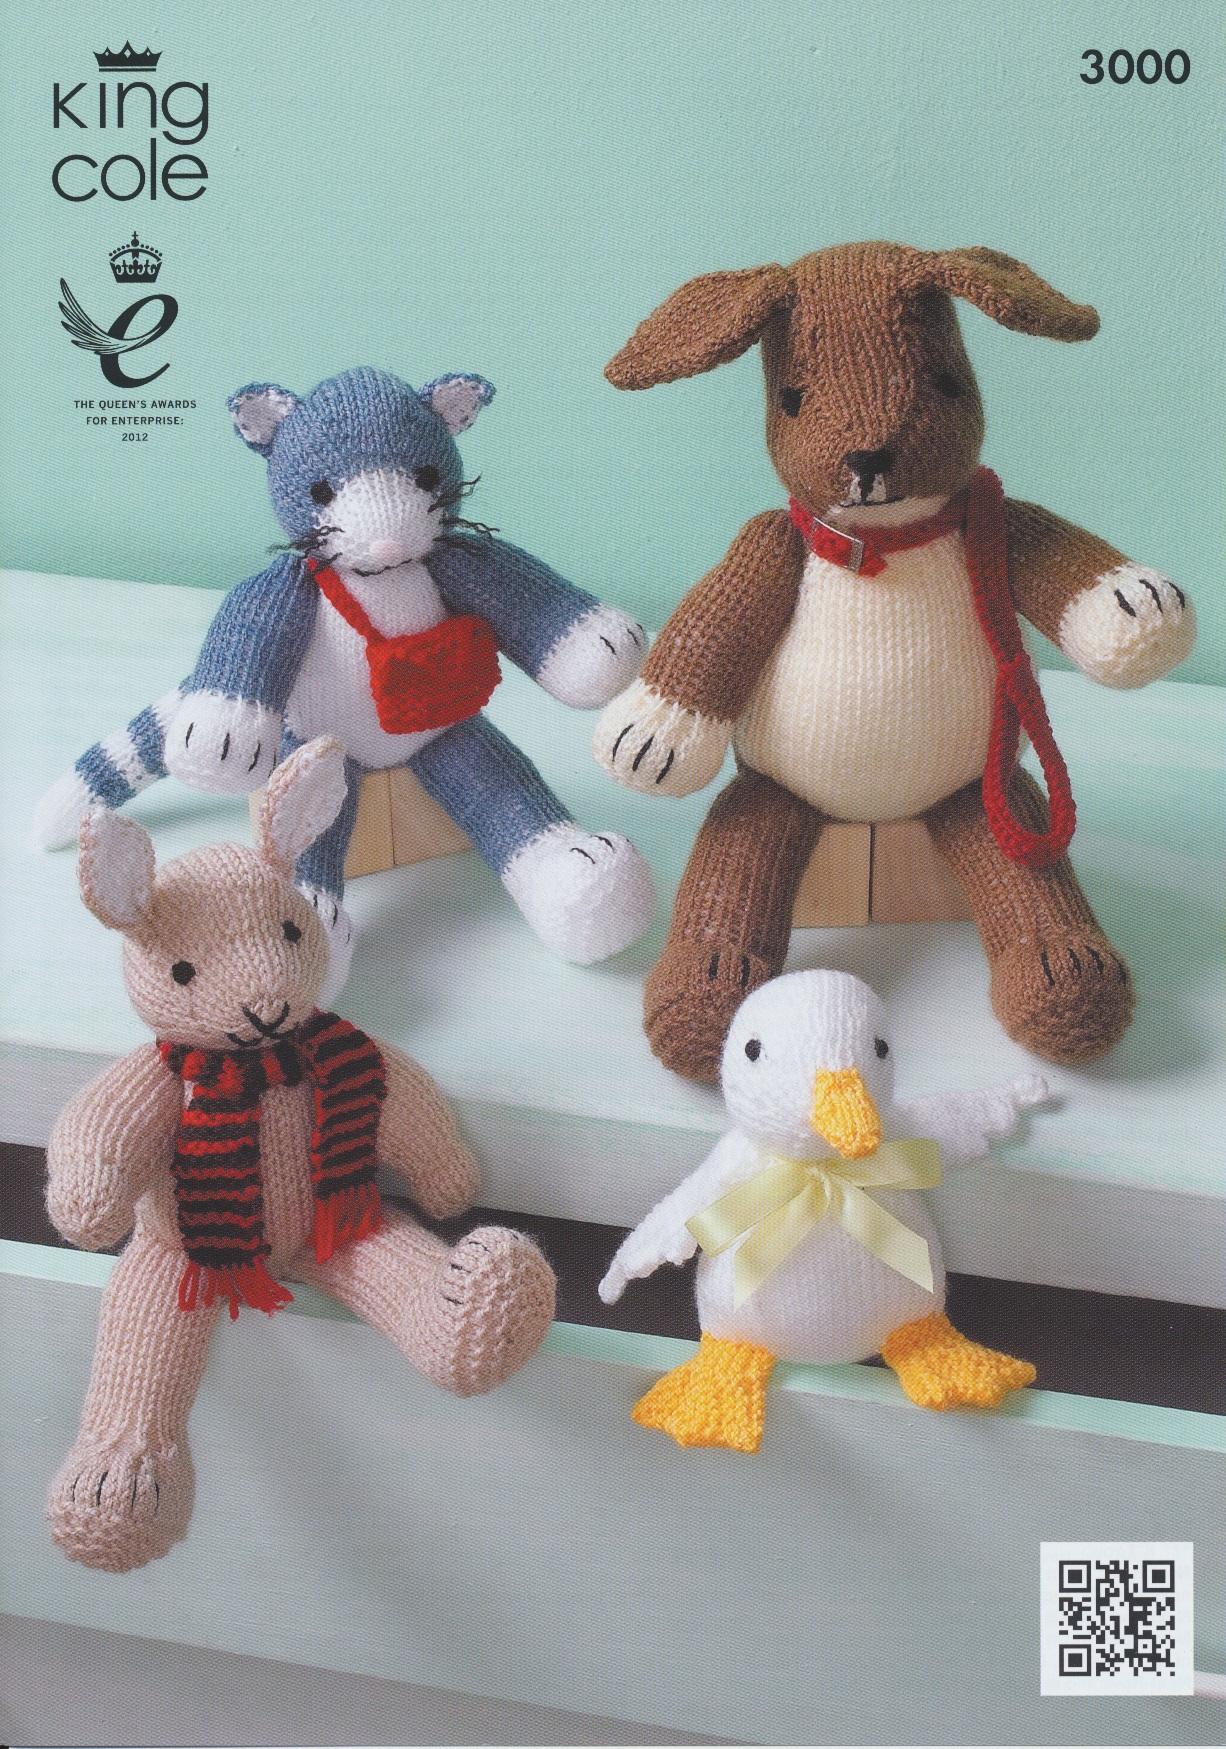 King Cole Penguin Knitting Pattern : King Cole Animal Characters Rabbit Duck Cat Dog DK Aran Knitting Pattern 3000...